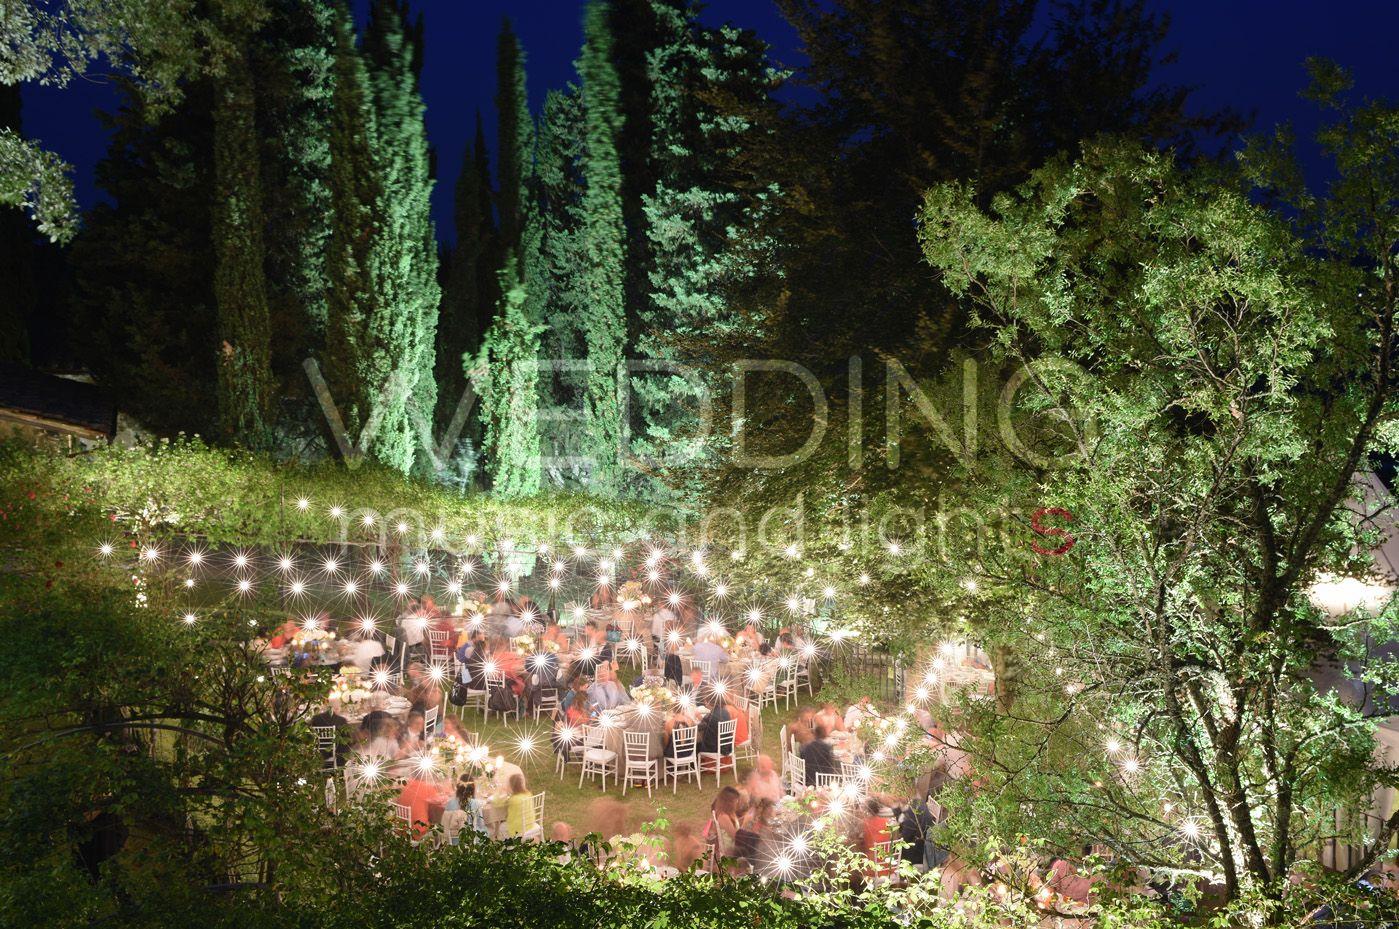 #weddinglighting #weddinglights #weddingday #wedding #stringoflights #stringlights #poolparty #discolights #truss #trussing #weddinglovebug #bridebook #bride #bridal #matrimonio #weddingplanner #uplighting #ledlighting #tuscany #castello #castle #chianti #gaioleinchianti #gaiole #radda #raddainchianti #volpaia #castellodivolpaia #volpaiacastle